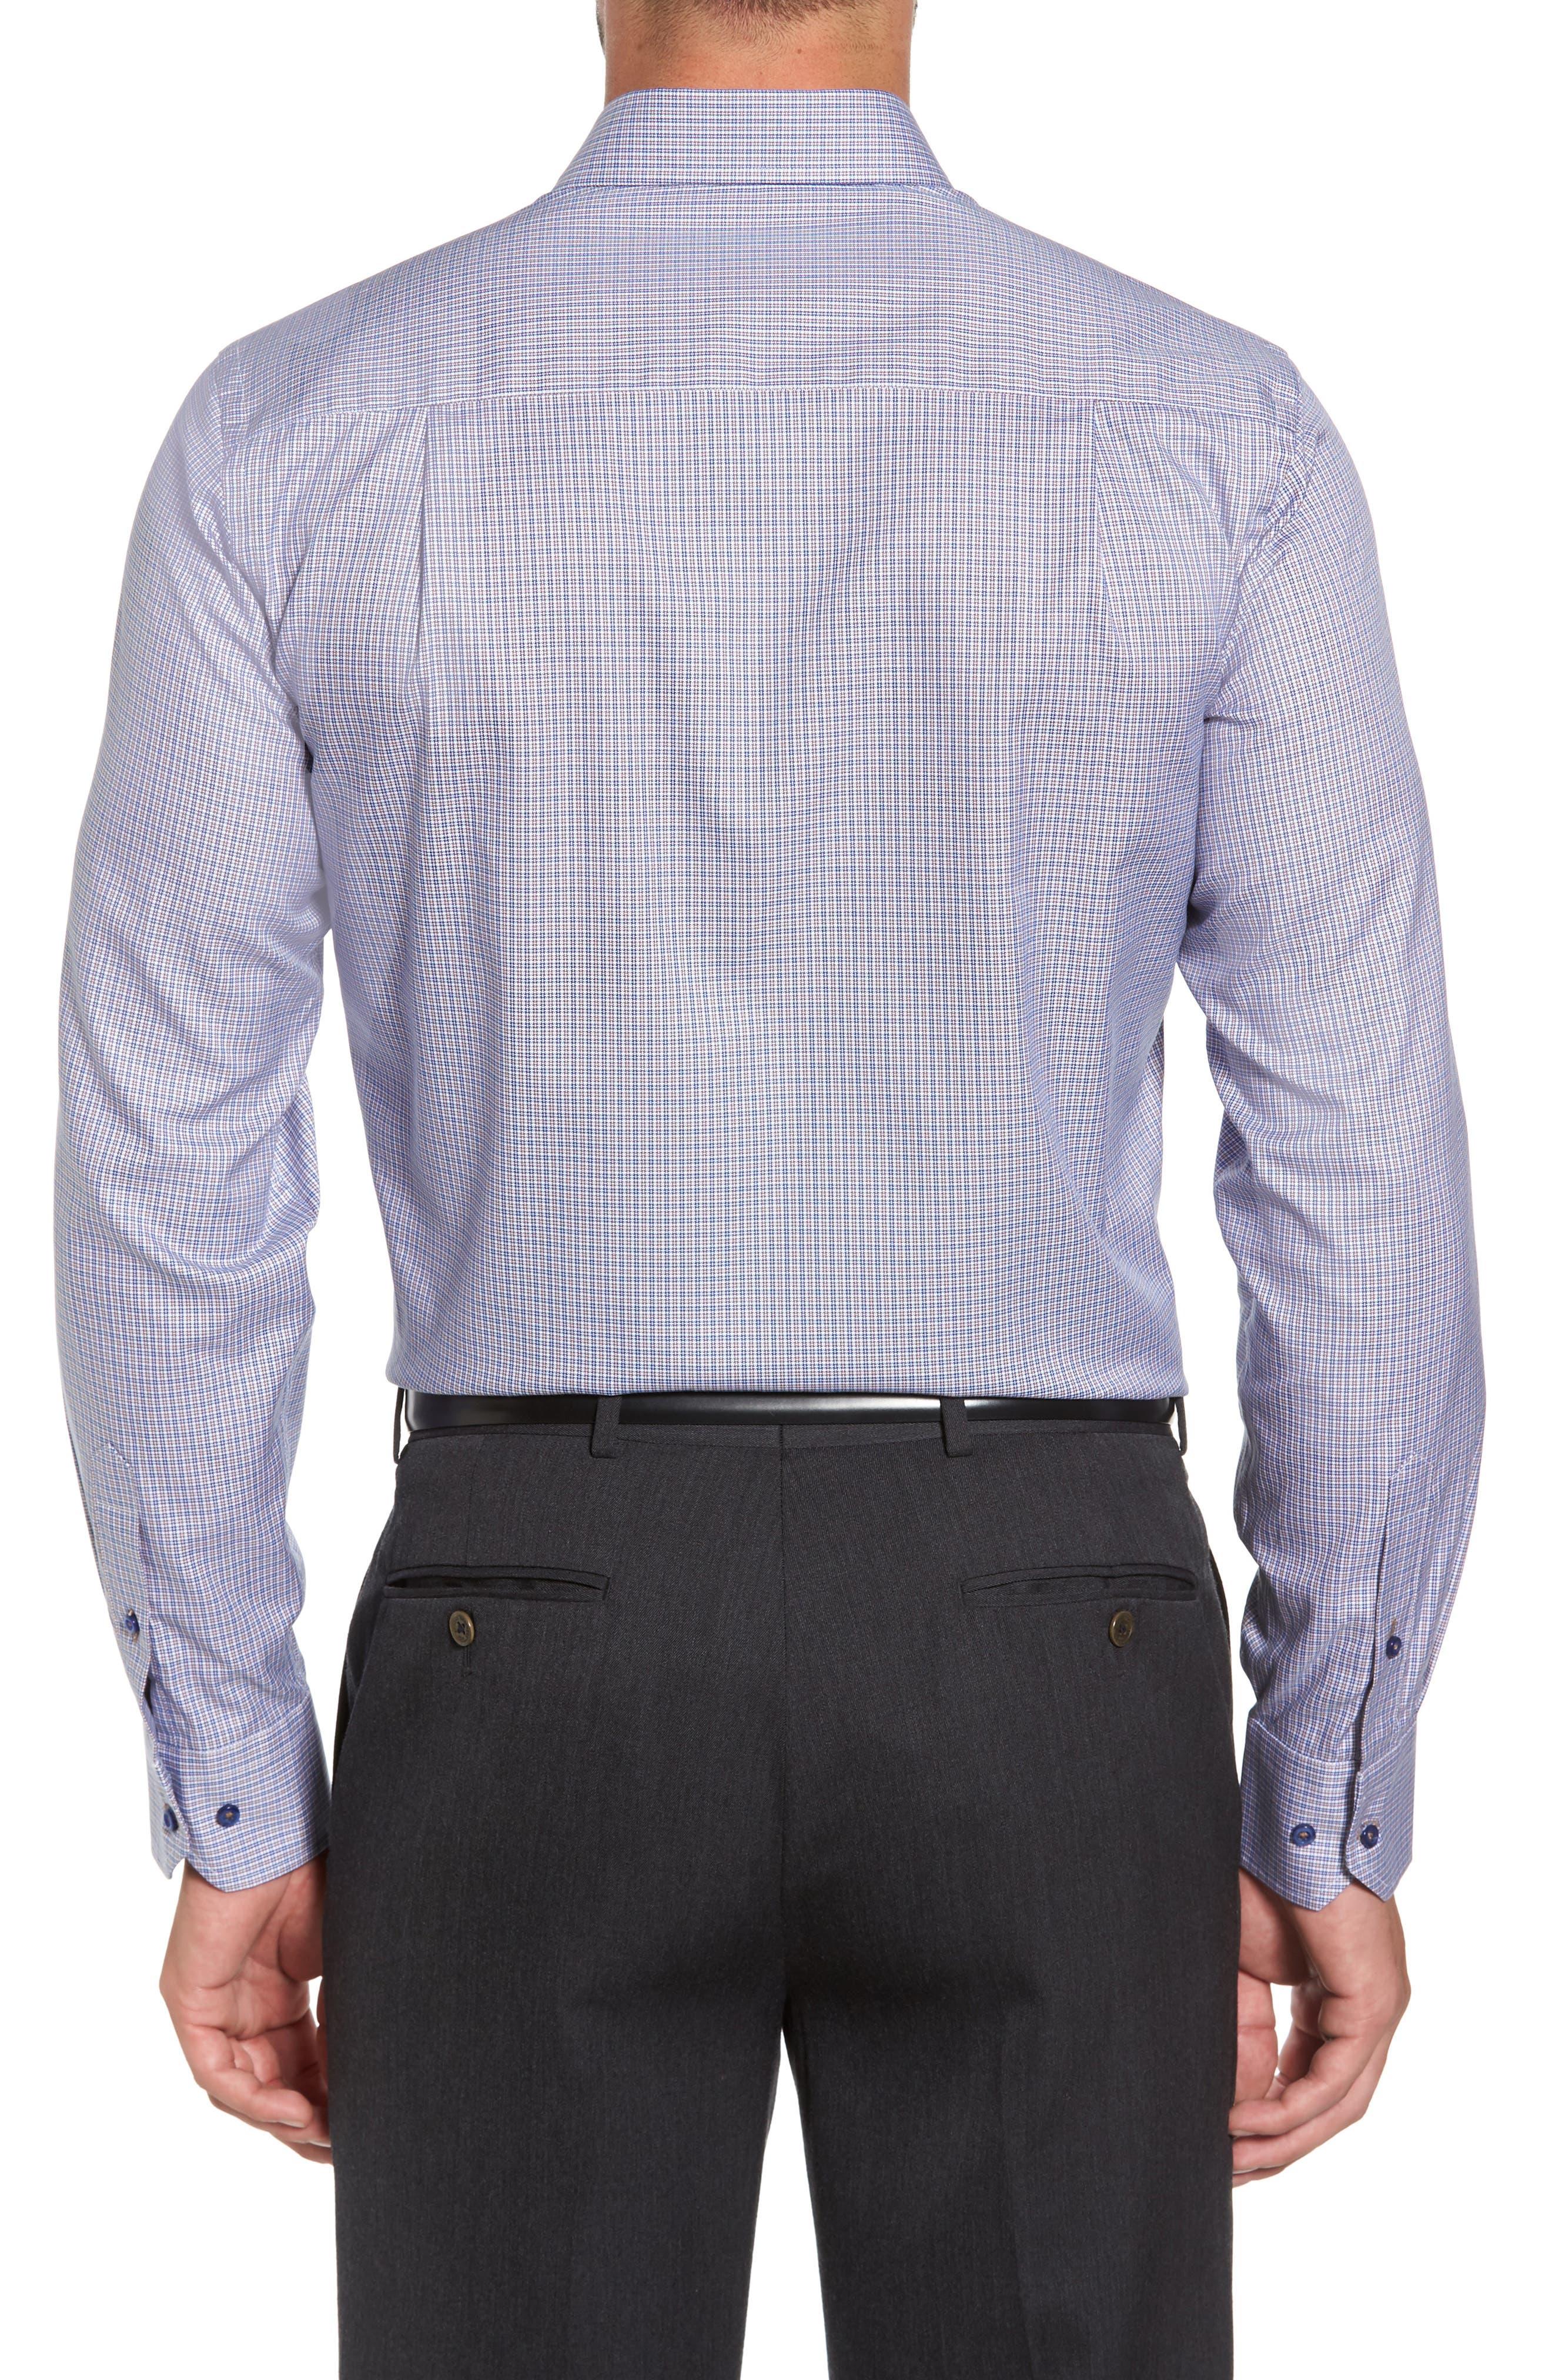 Microcheck Sport Shirt,                             Alternate thumbnail 2, color,                             Navy/ Chocolate